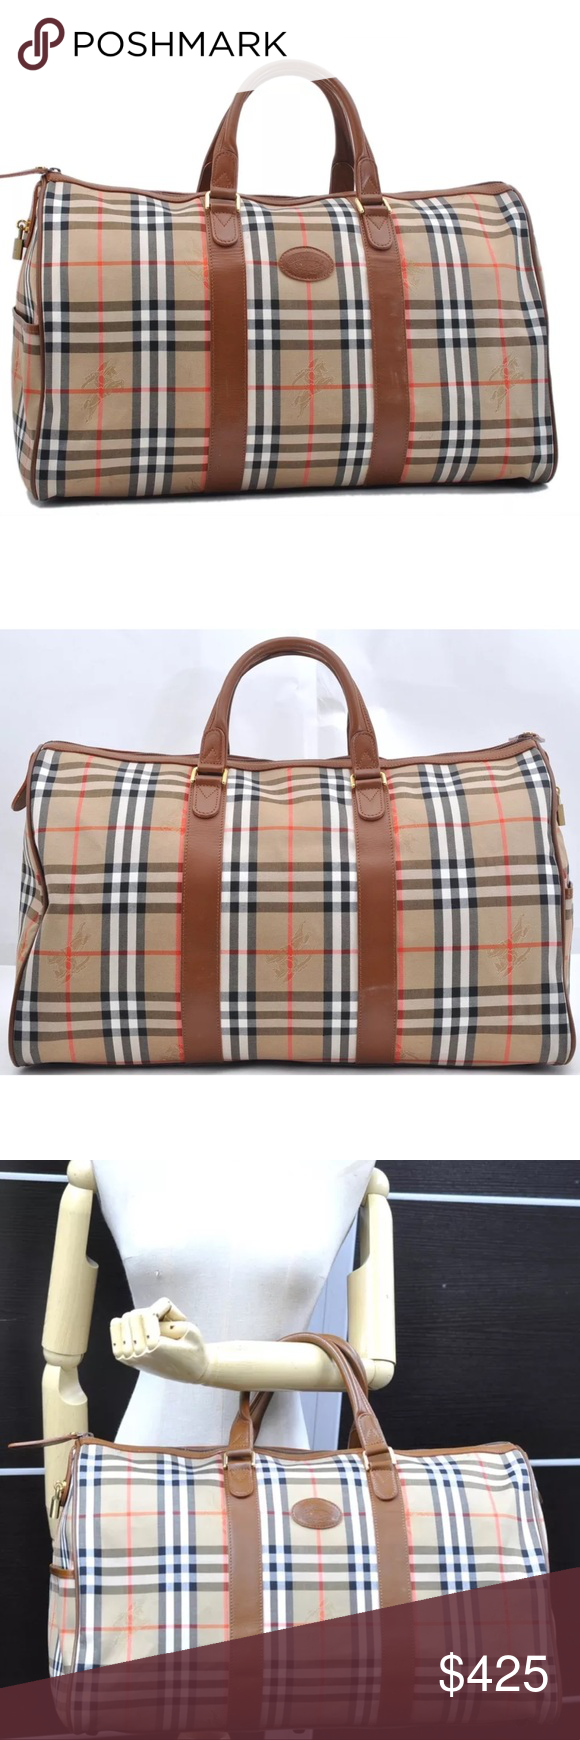 4fdf6ca35ac2 Authentic BURBERRY unisex travel bag Weekender Authentic Burberry travel bag  Weekender. Classic nova